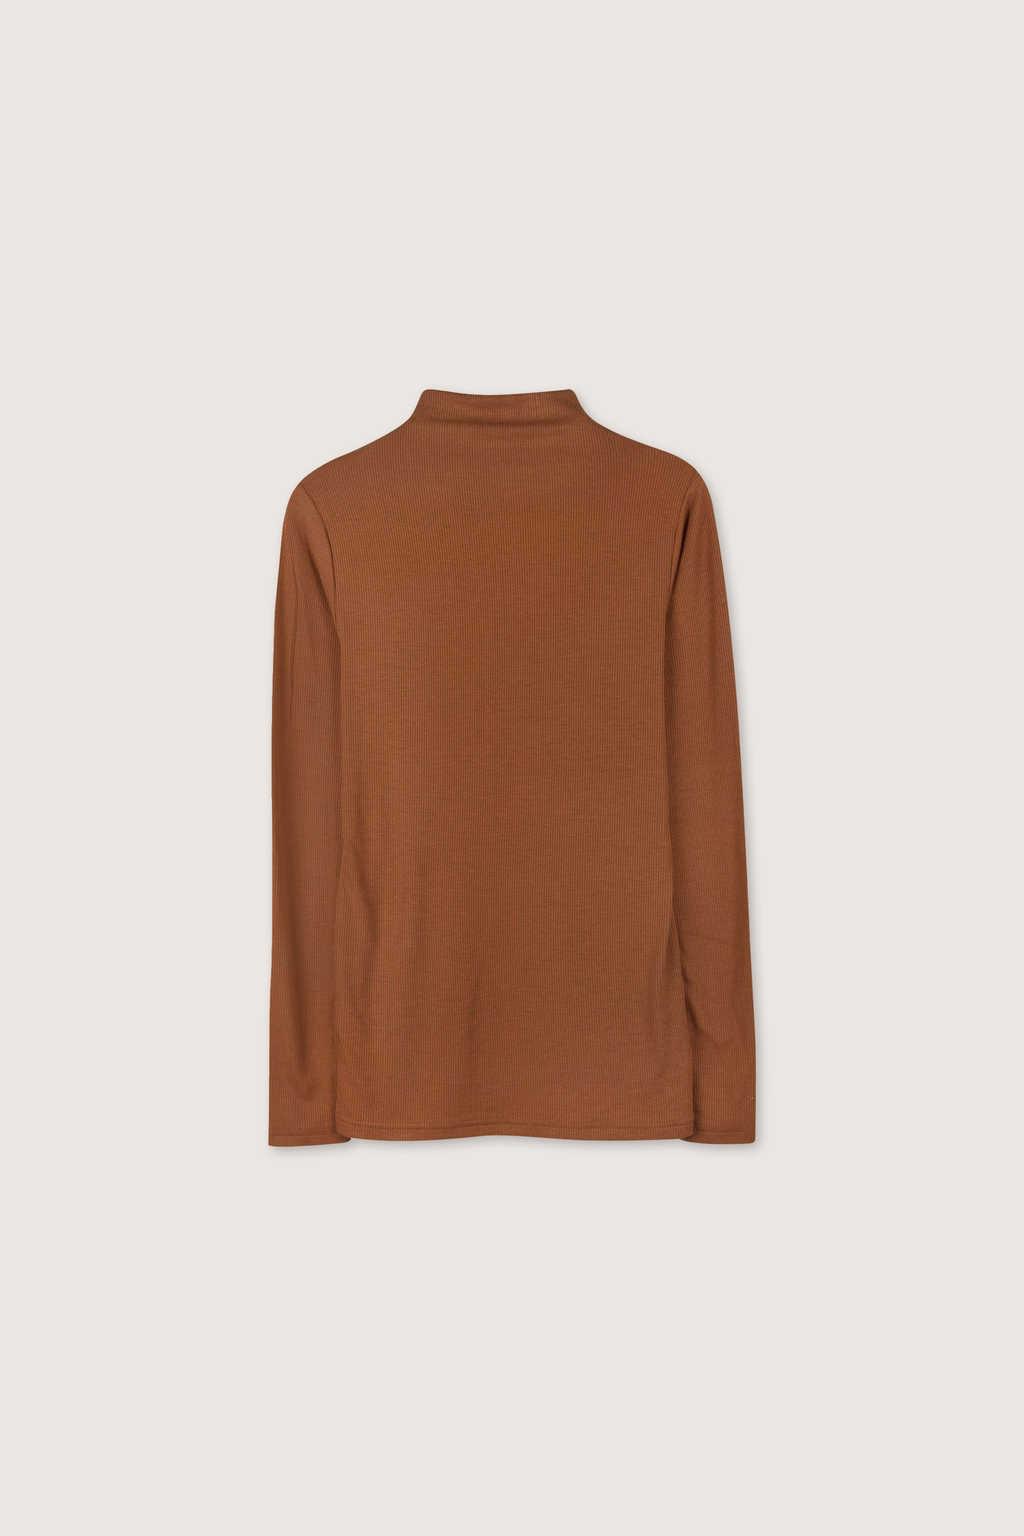 TShirt H429 Brown 7